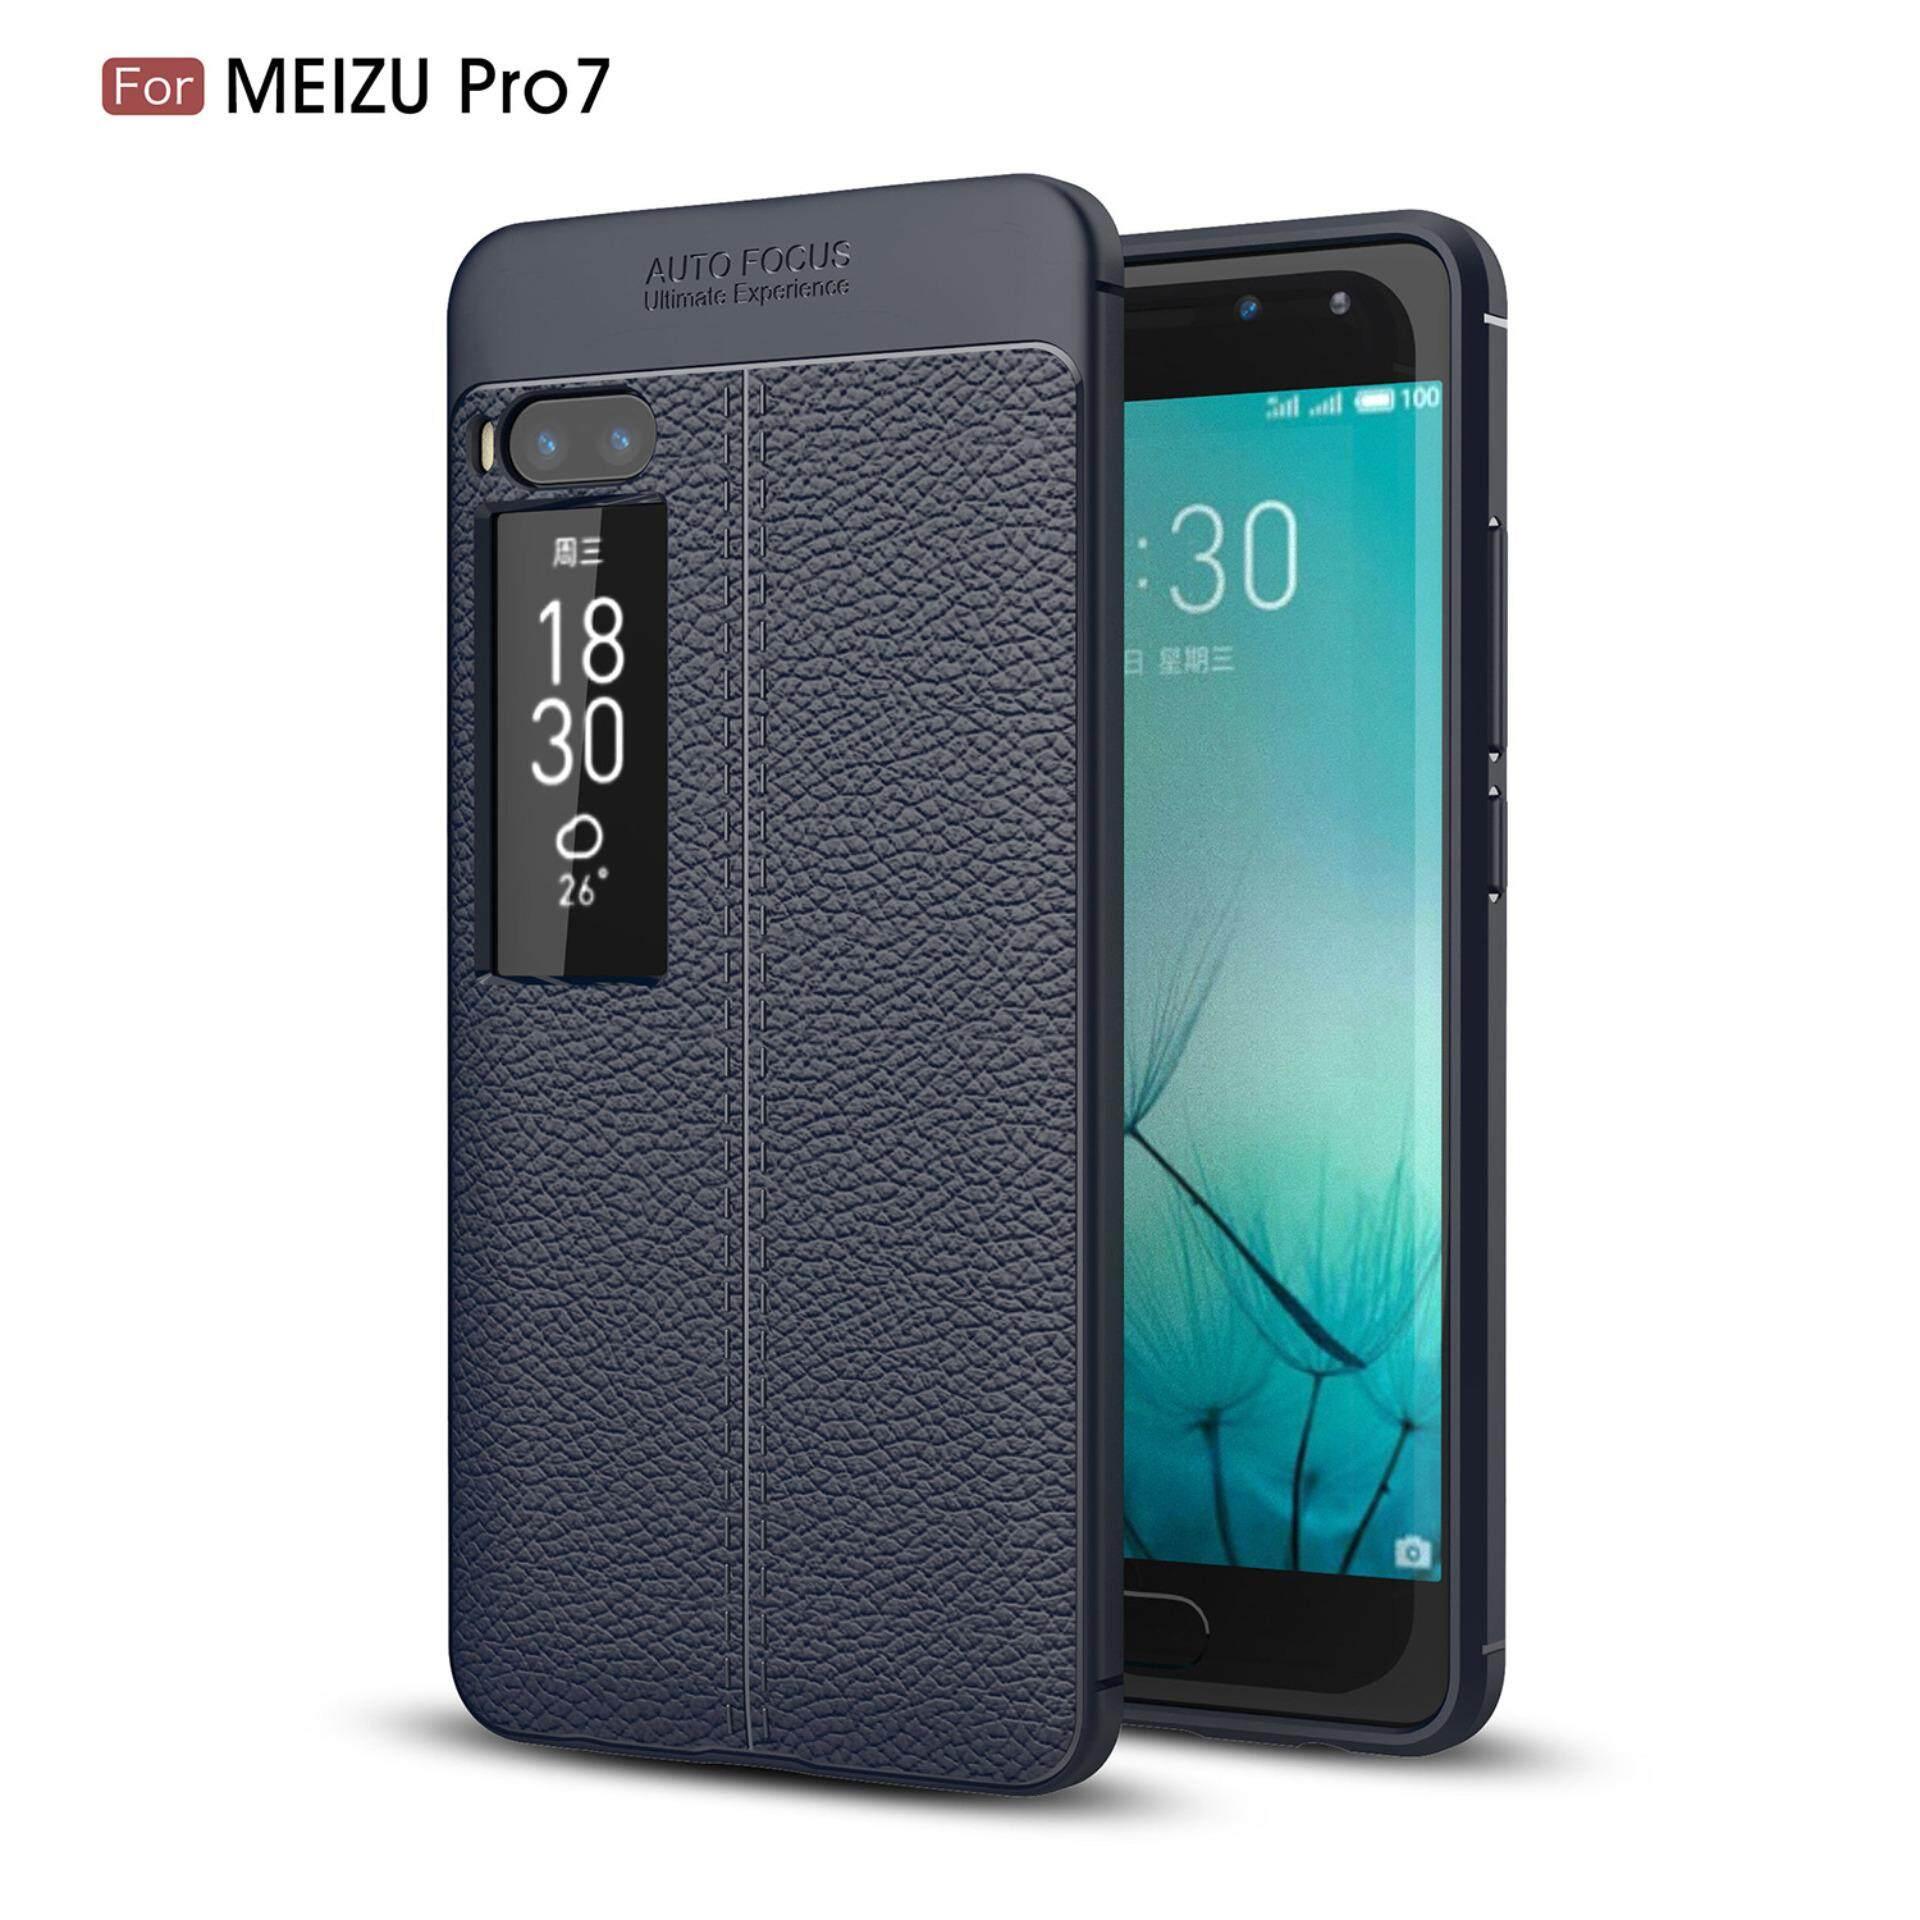 Meizu Pro 7 Case, Kunpon 3D Skin Painting Non Slip Armor Shock Absorption Carbon Fiber